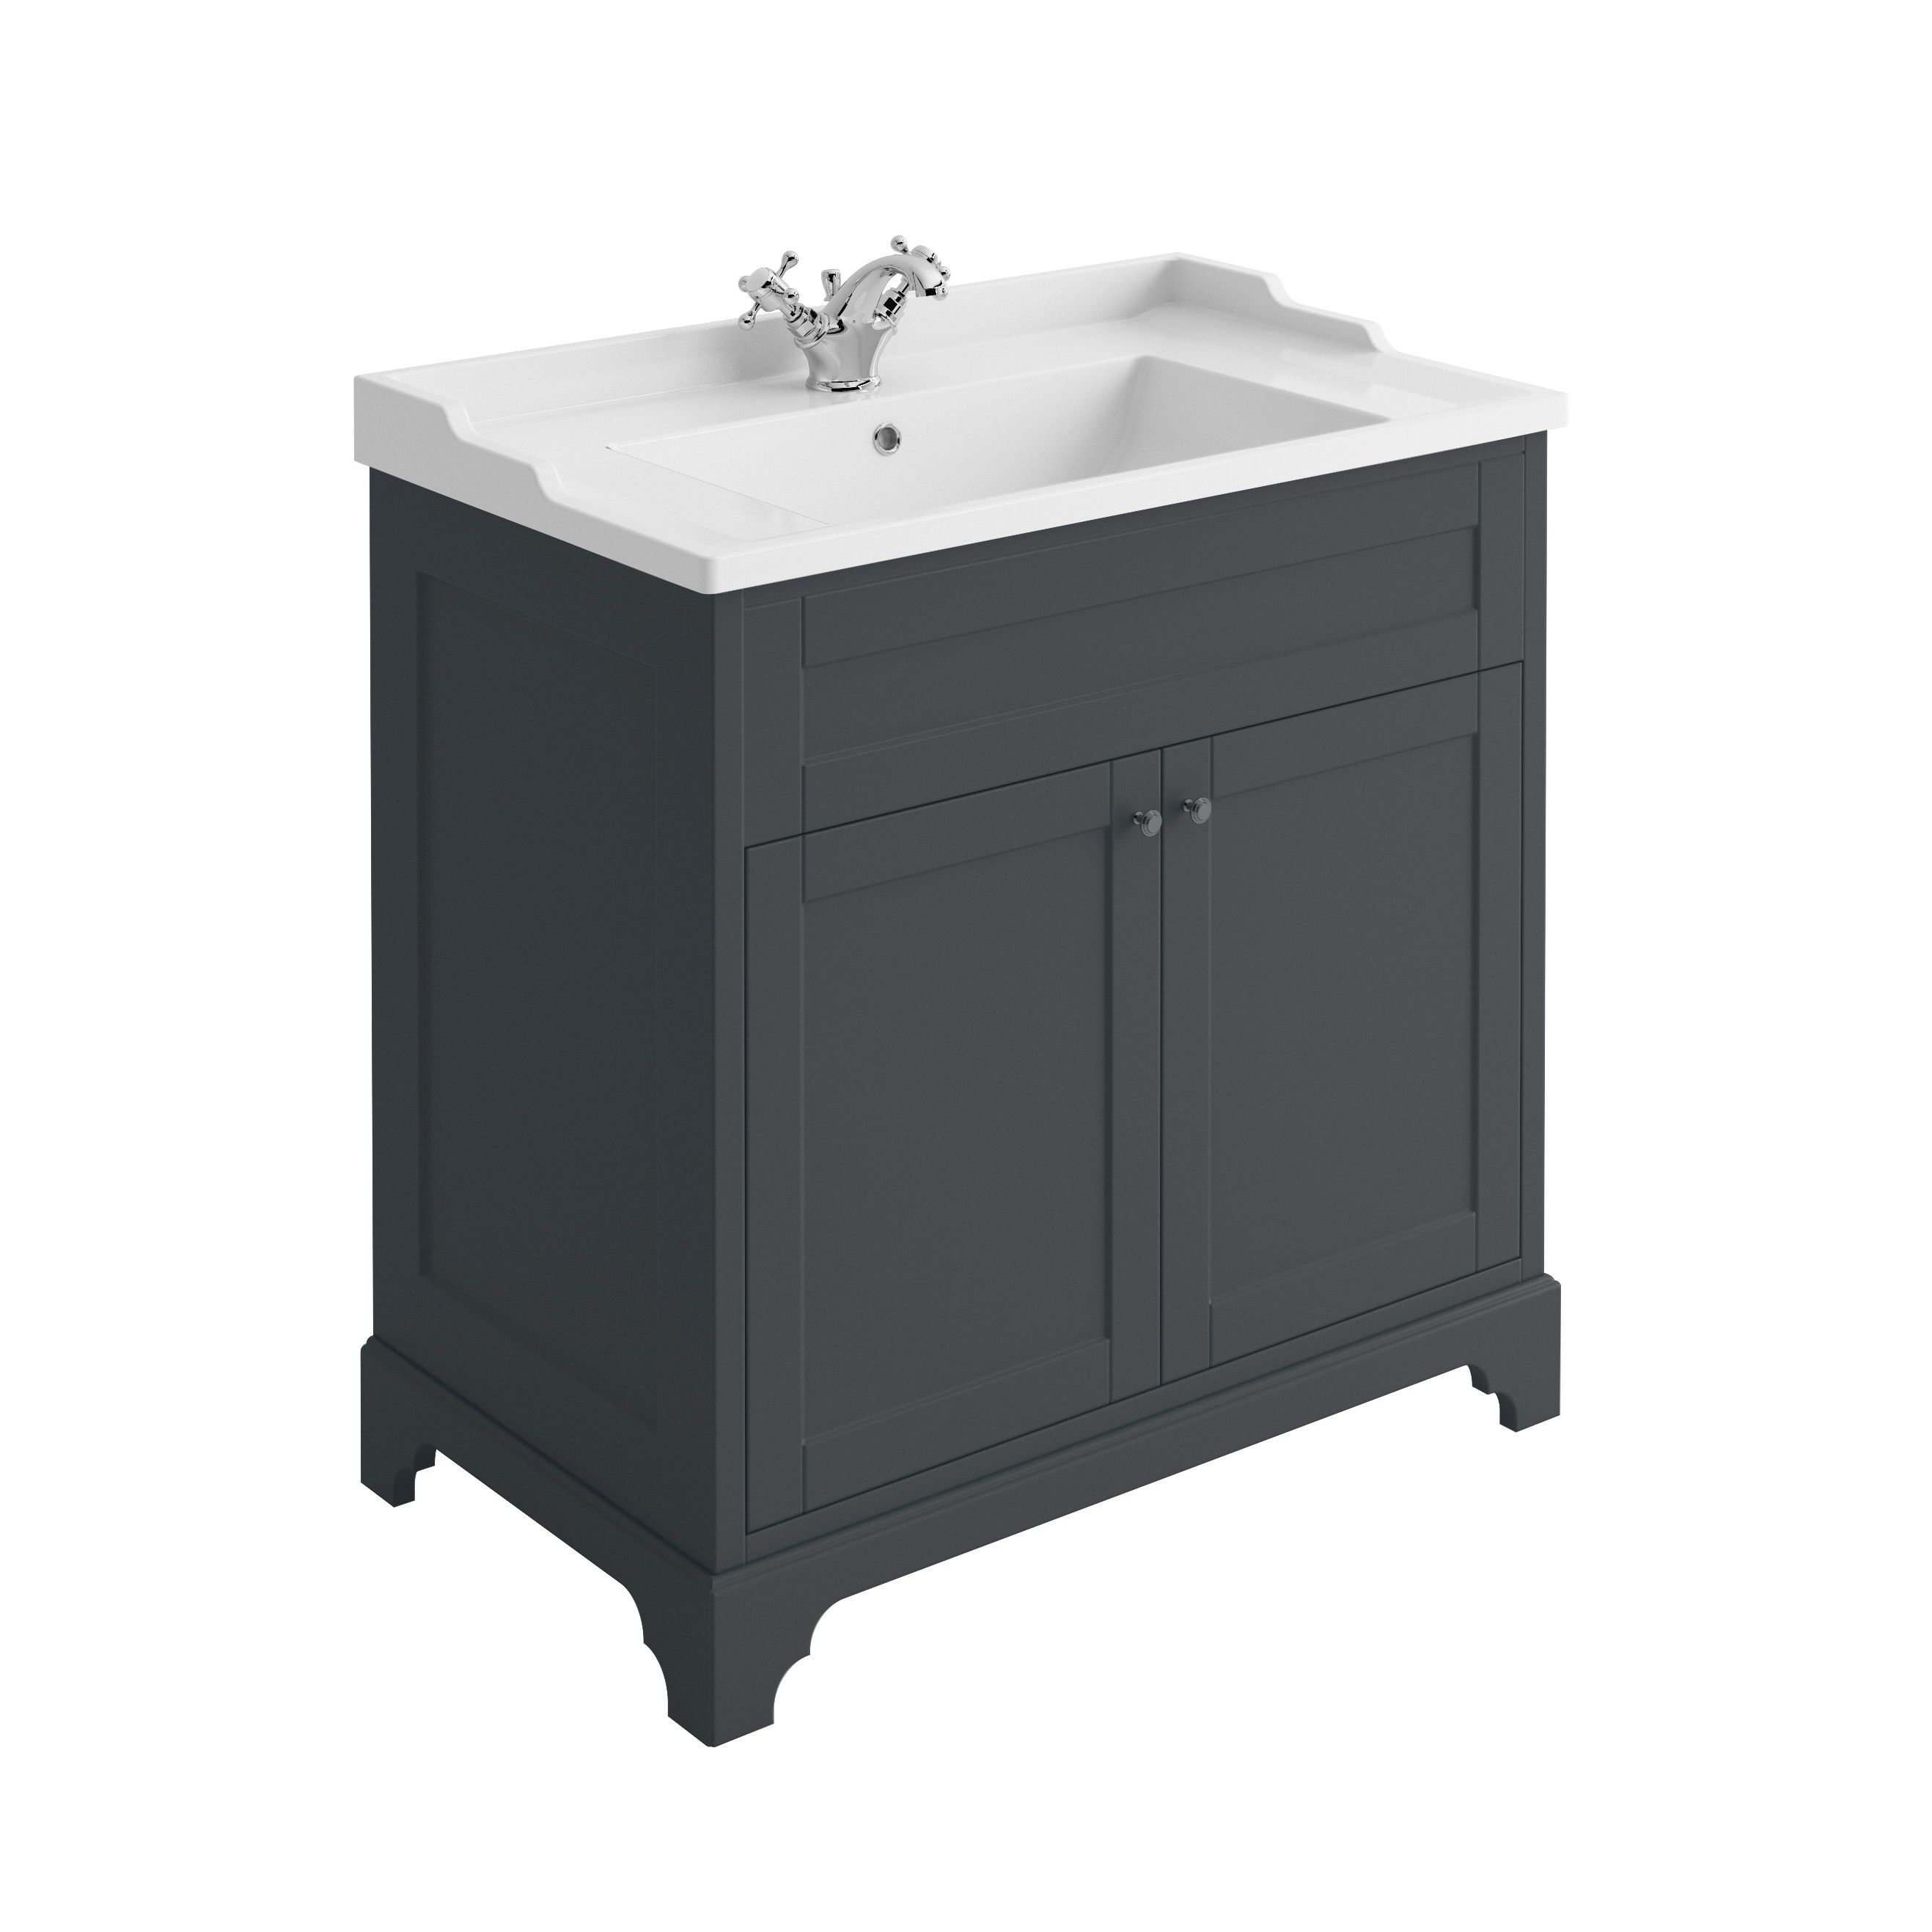 Arundel Midnight Grey Floor Standing Vanity Unit 800mm Easy Vanity Units Traditional Vanity Units Vanity